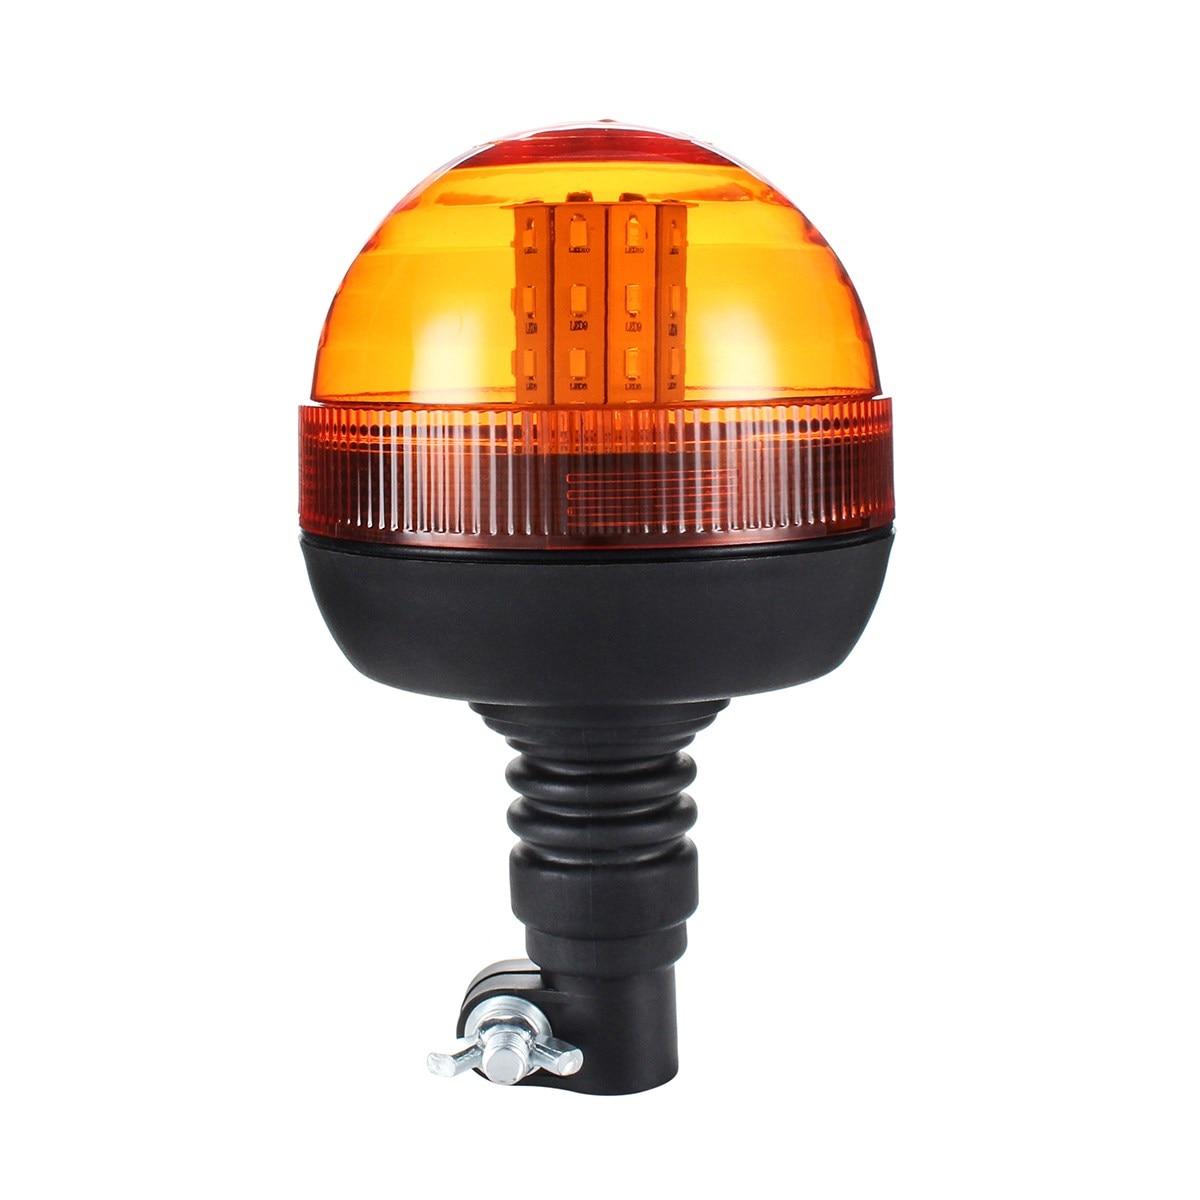 NEW LED Rotating Flashing Amber Beacon Flexible Tractor Warning Light 12V-24V Roadway Safety